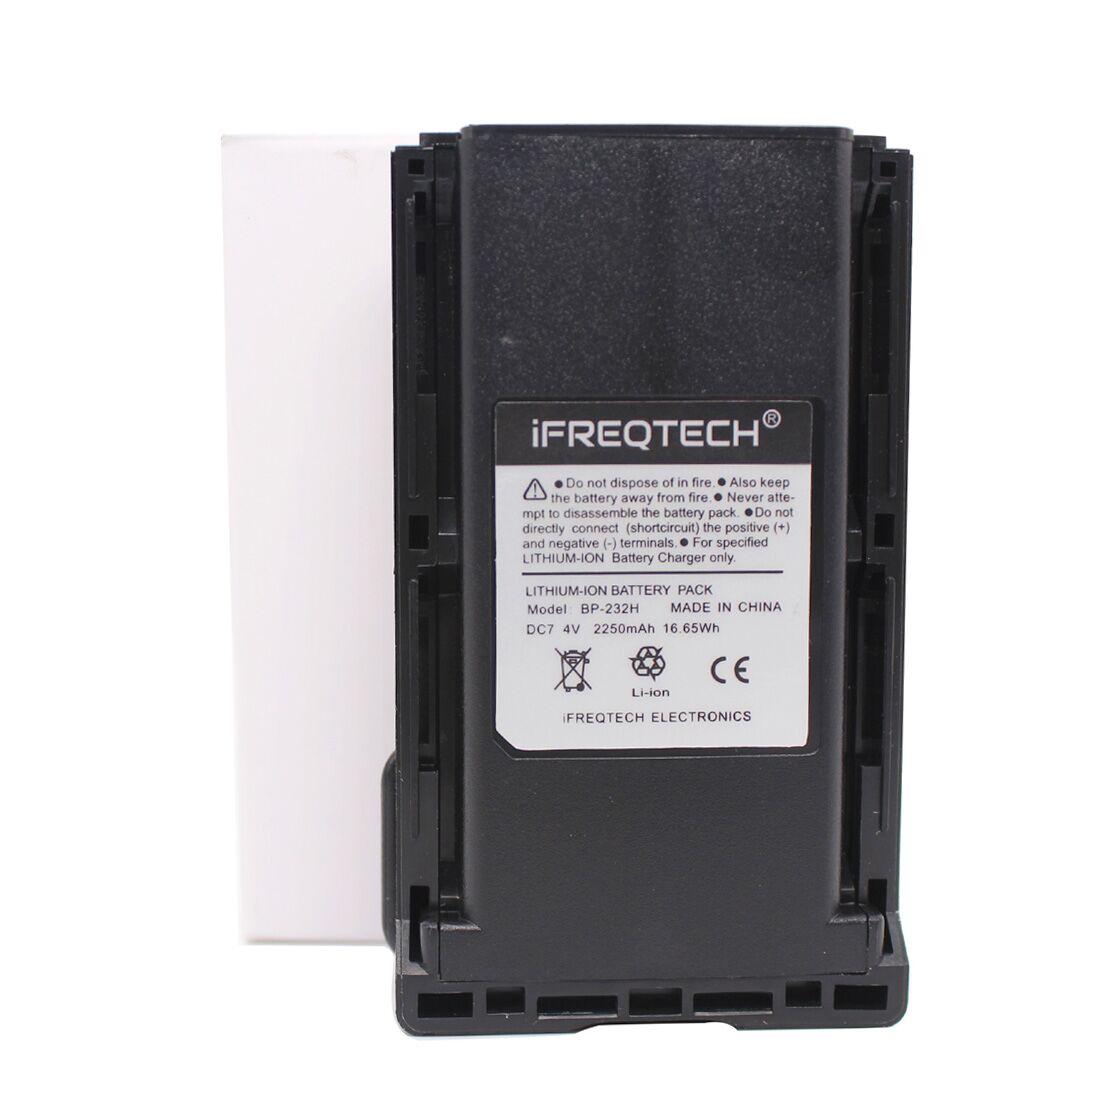 BP-232 BP-232H 2250mAh Battery For Icom Radio IC-A14 A14 F14 F16 F24 F26 F33GS F34G IC-F4021 F3011 IC-F4061 F4161DT/DS T/S F416